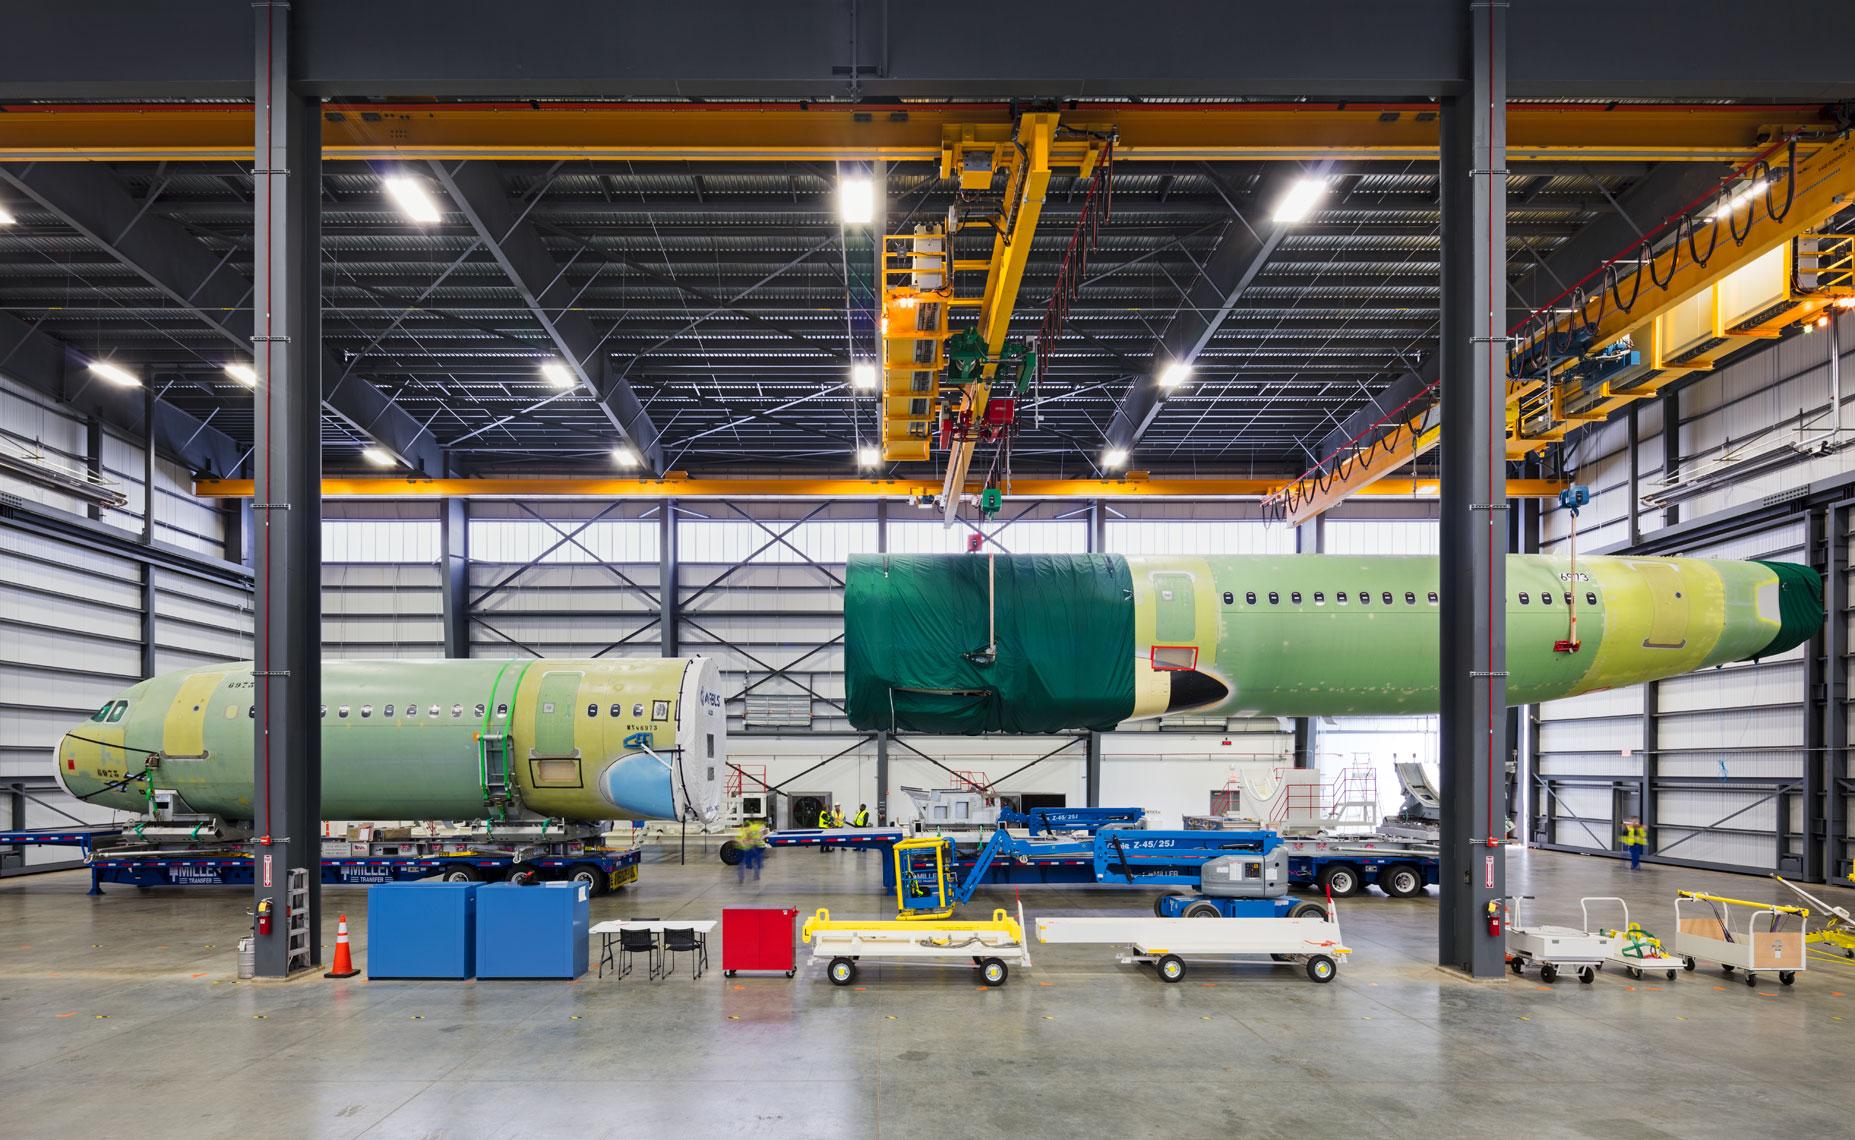 Payne_Airbus_0253.jpg